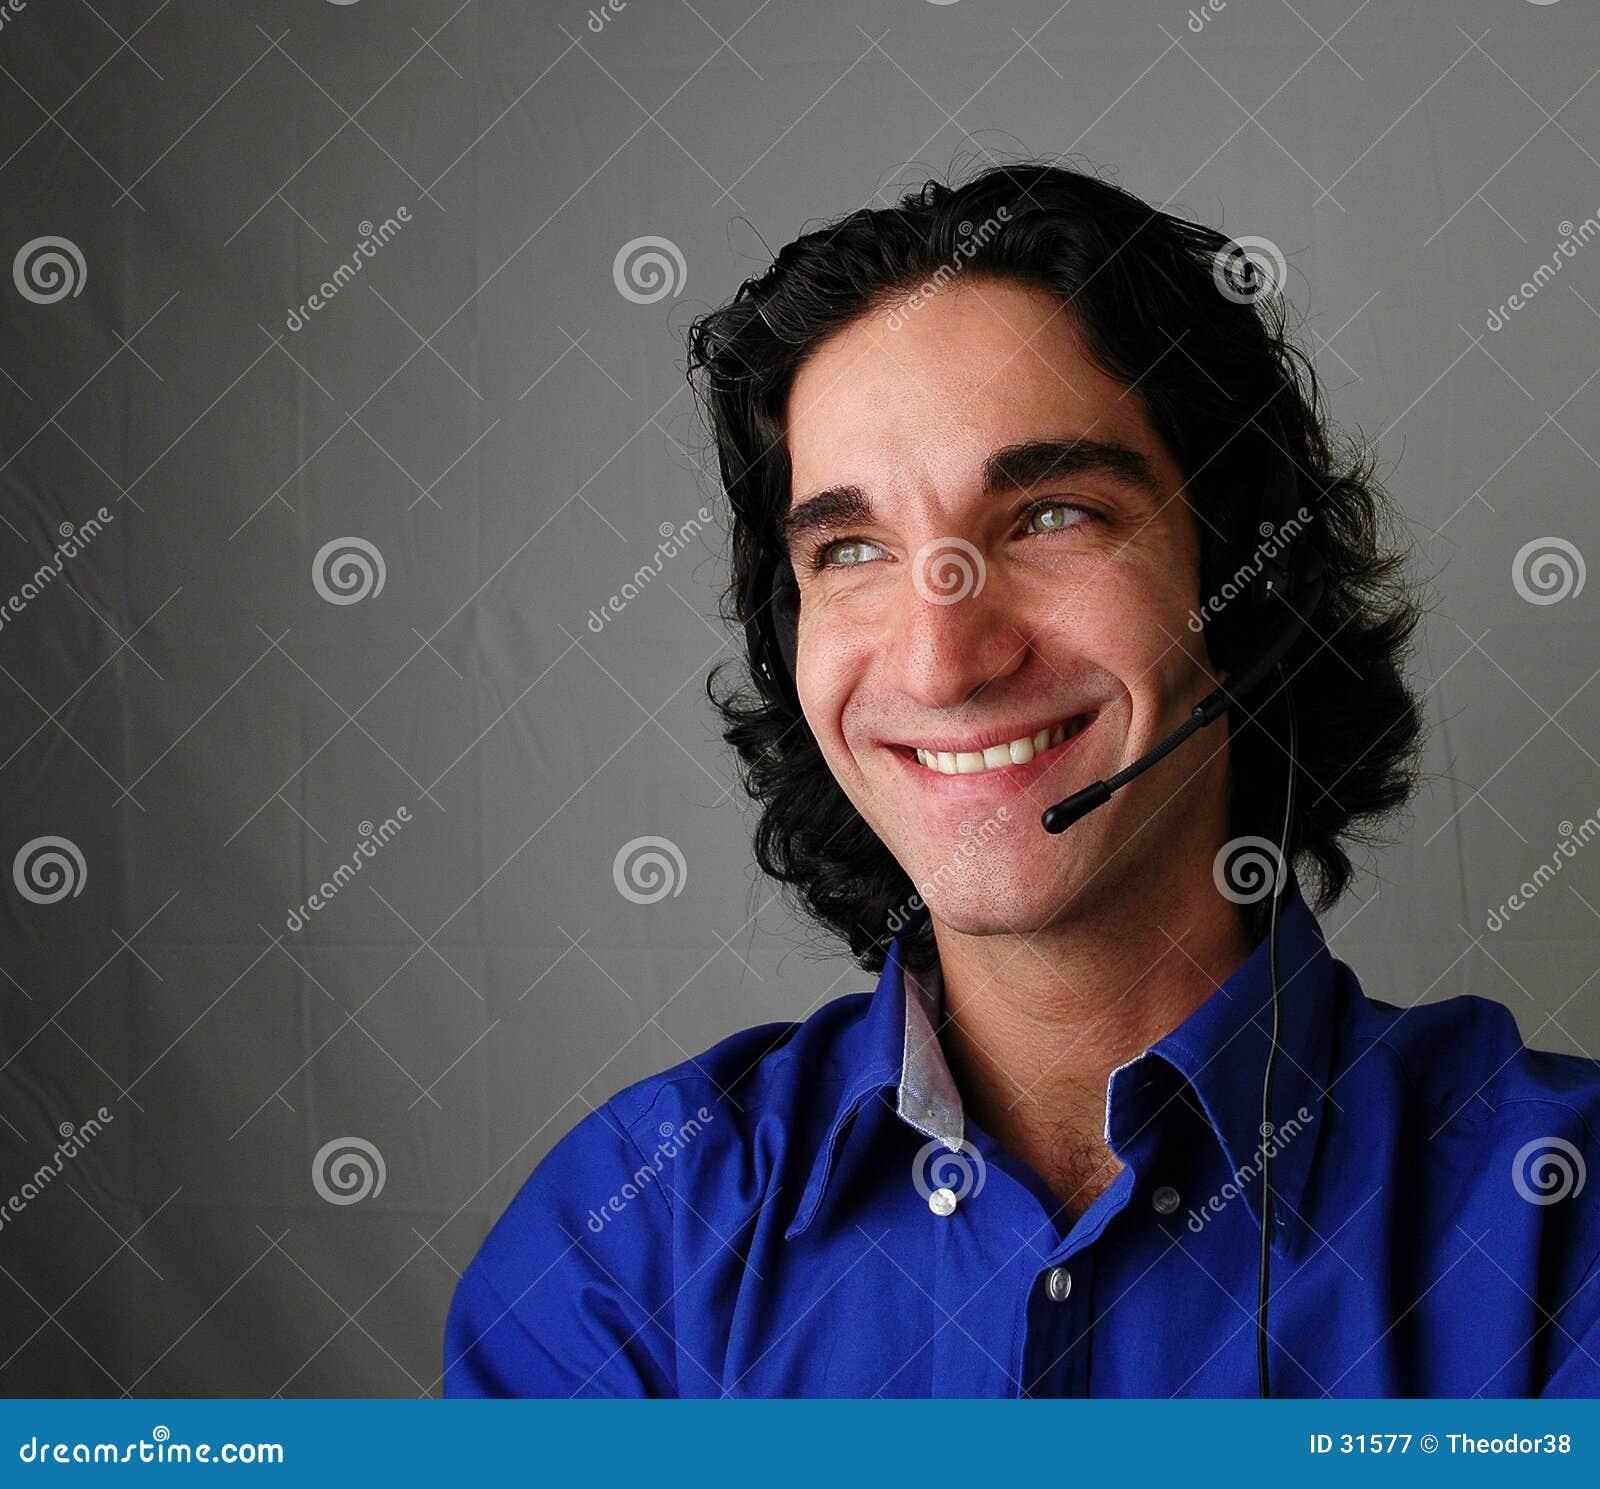 8 obsługi klienta